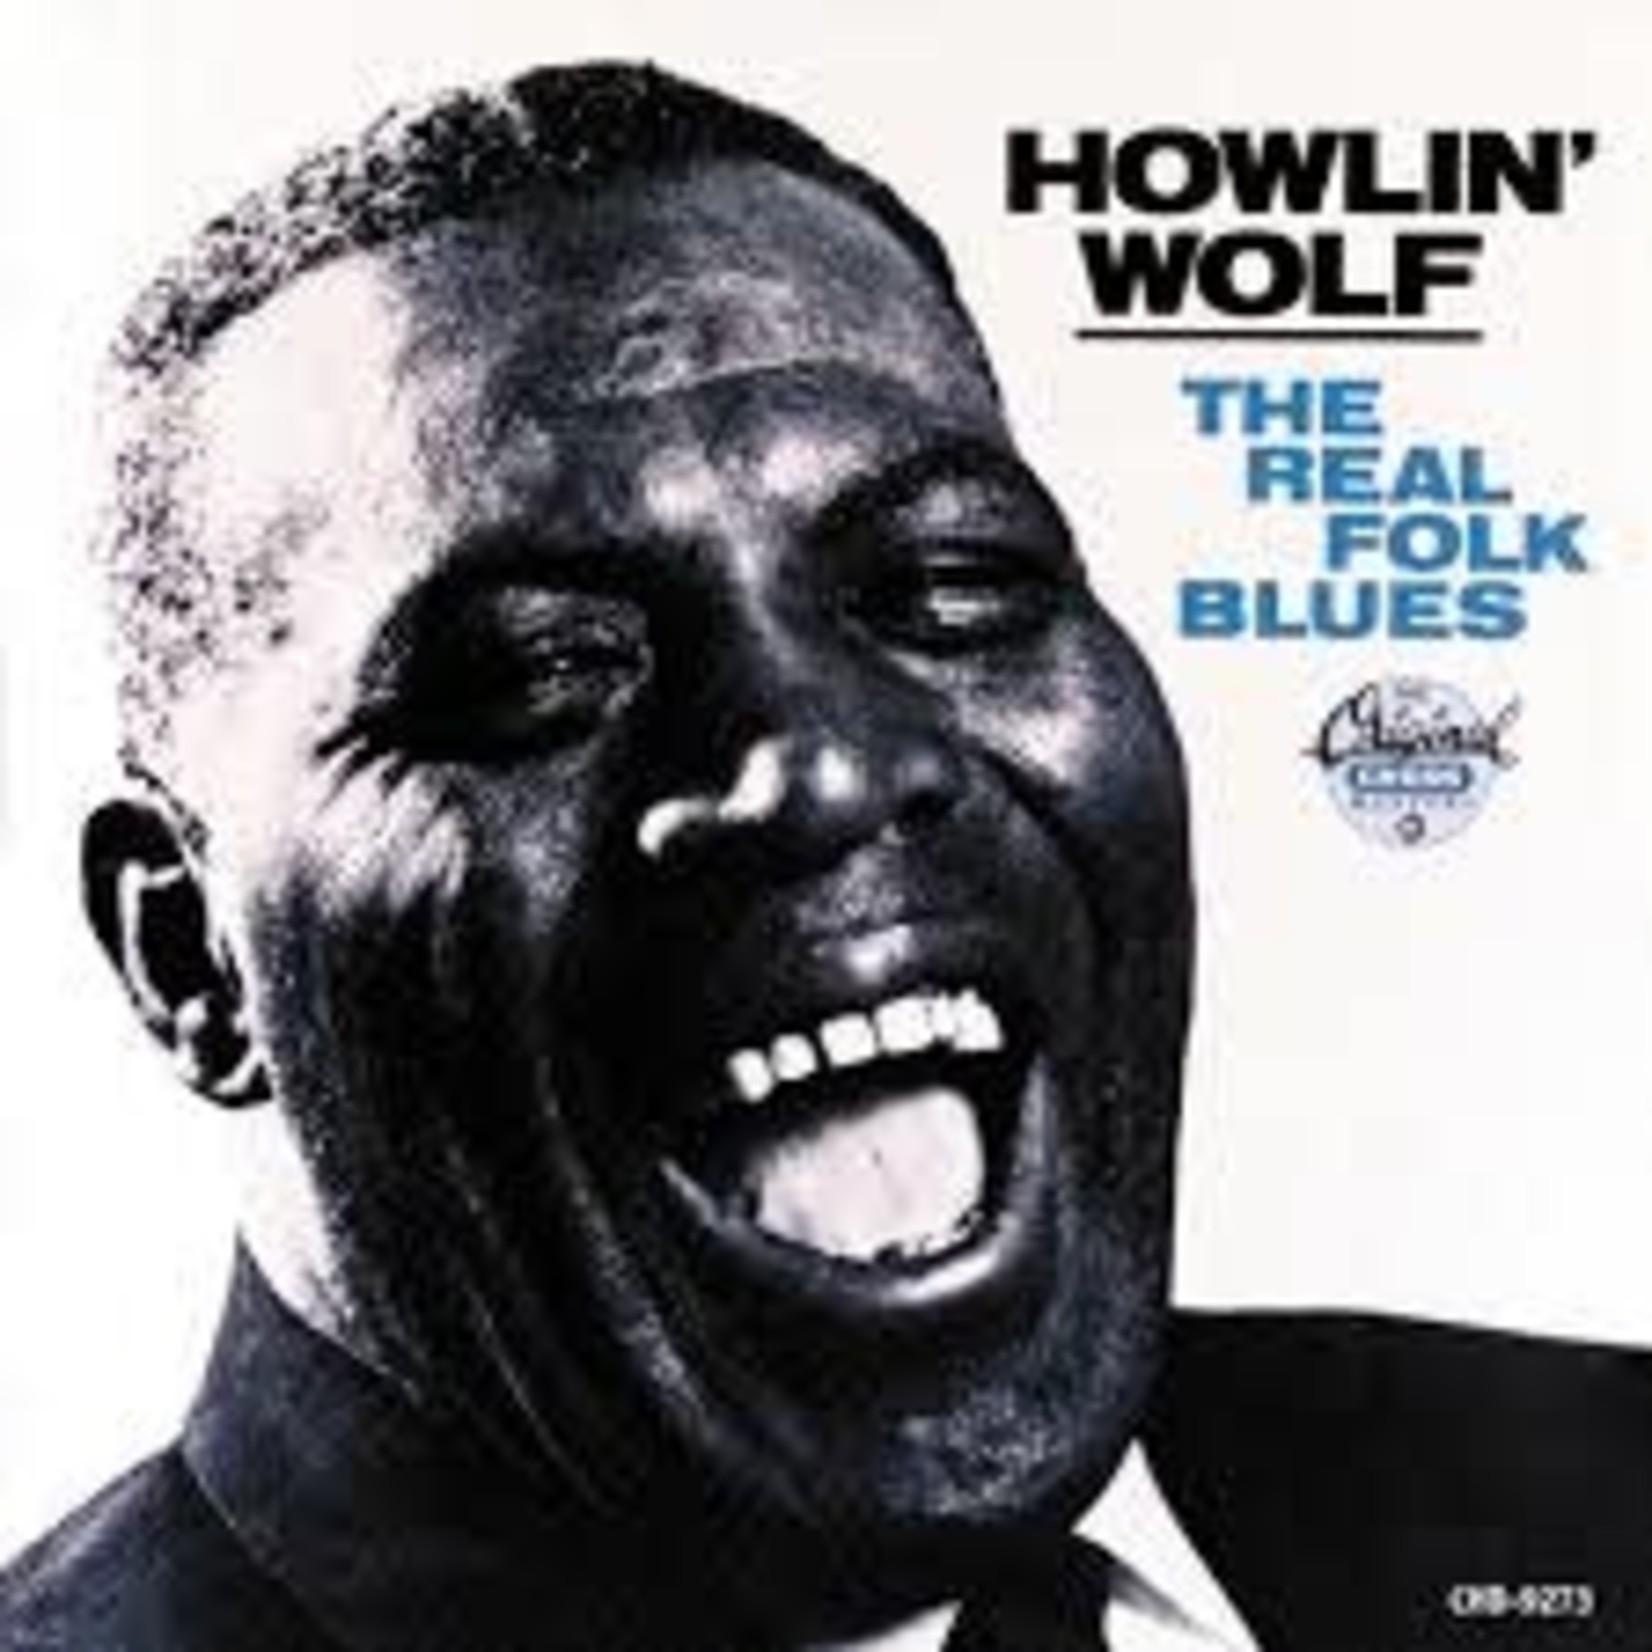 Vinyl Howlin' Wolf - The Real Folk Blues